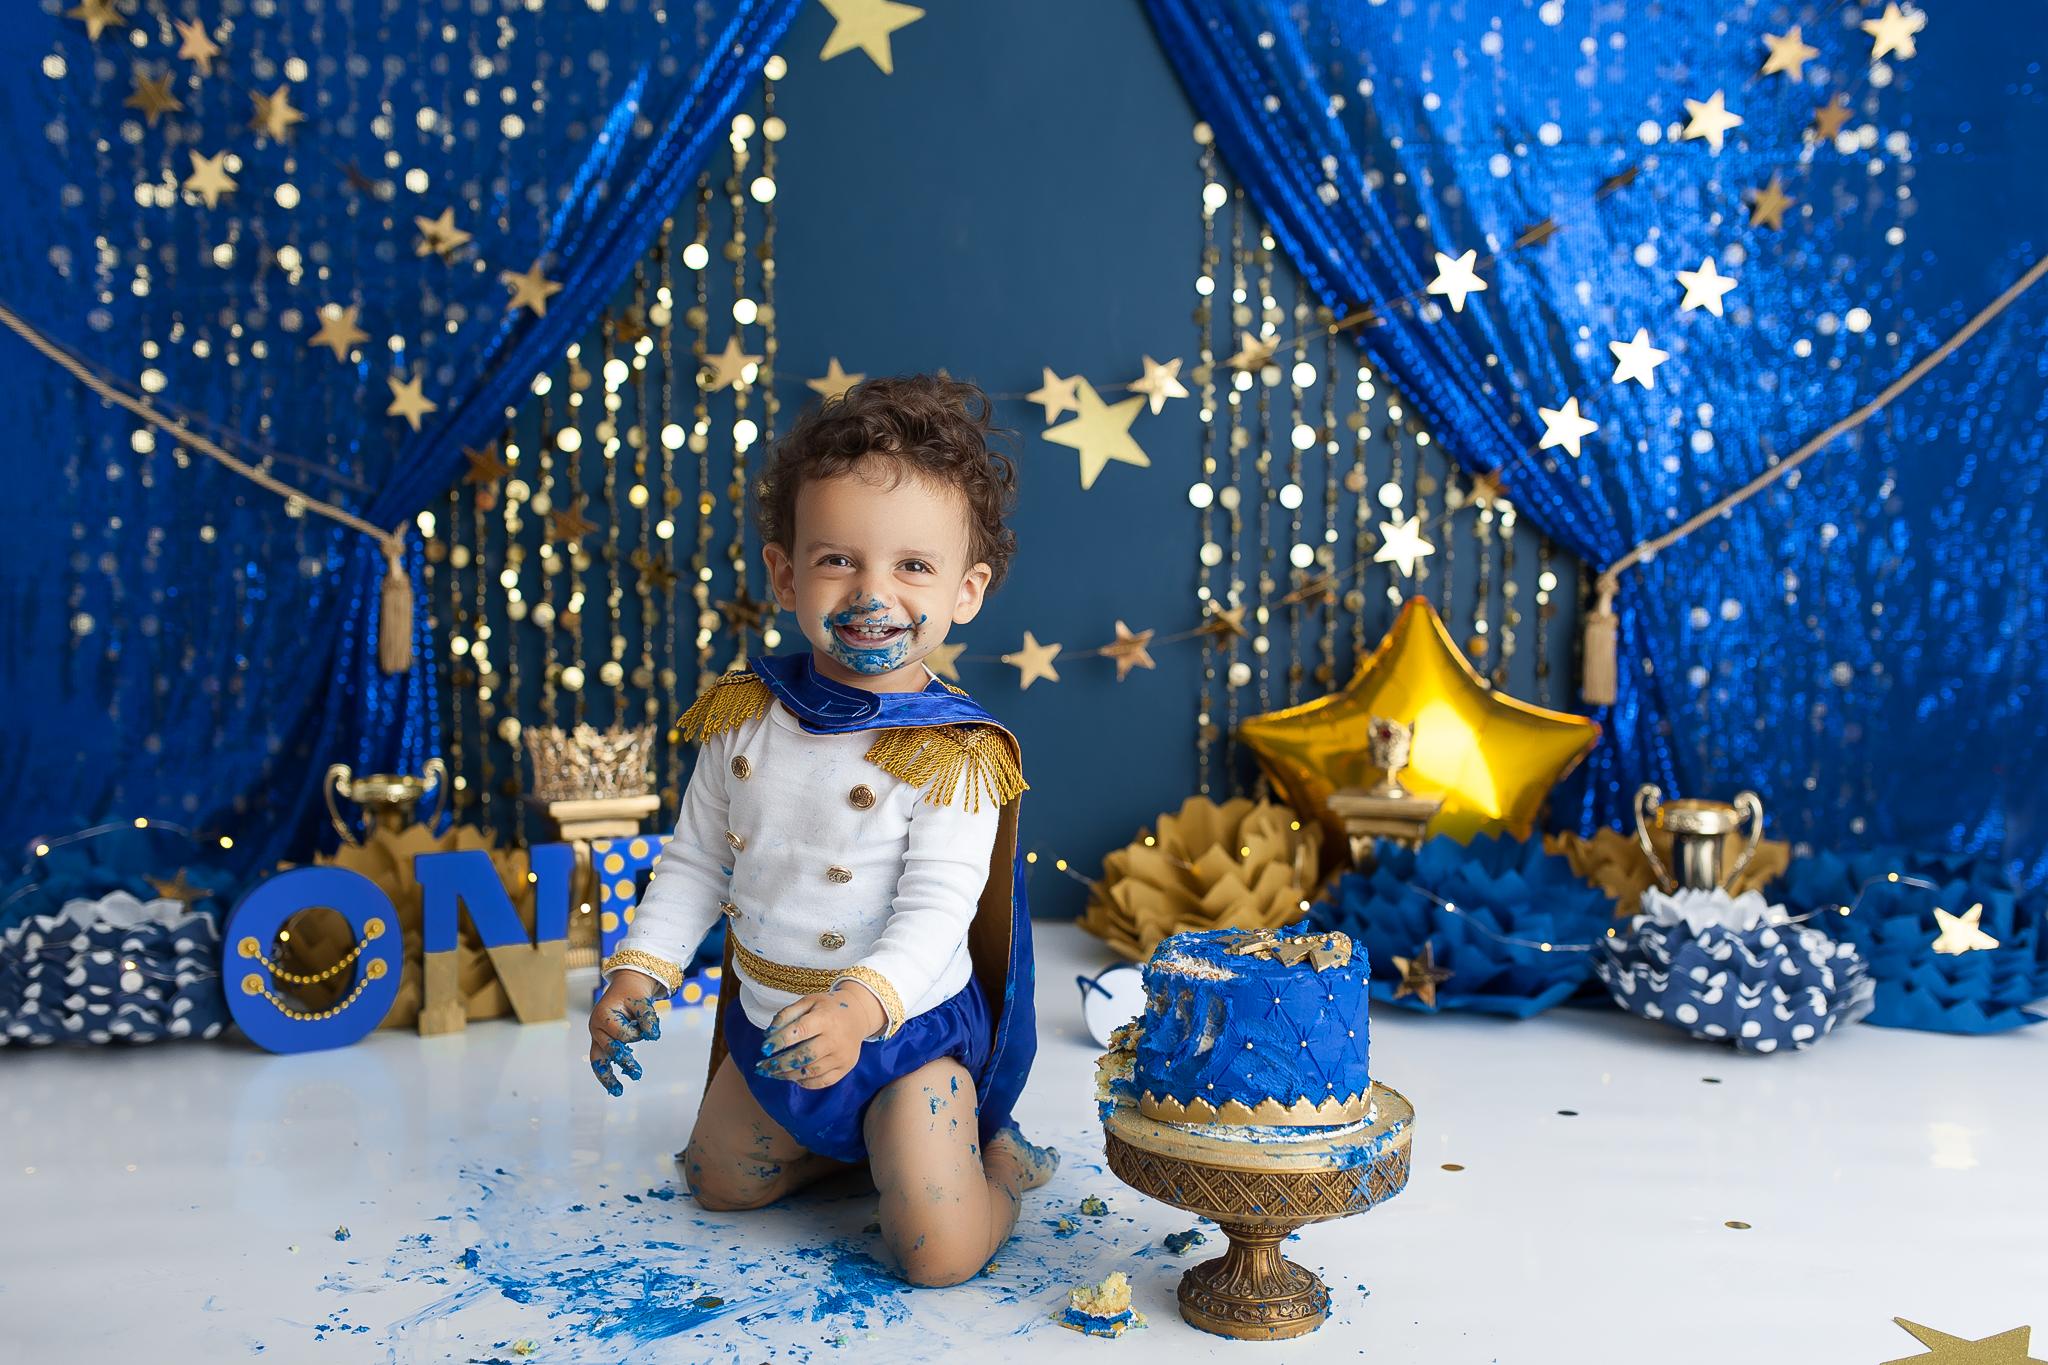 royal cake smash